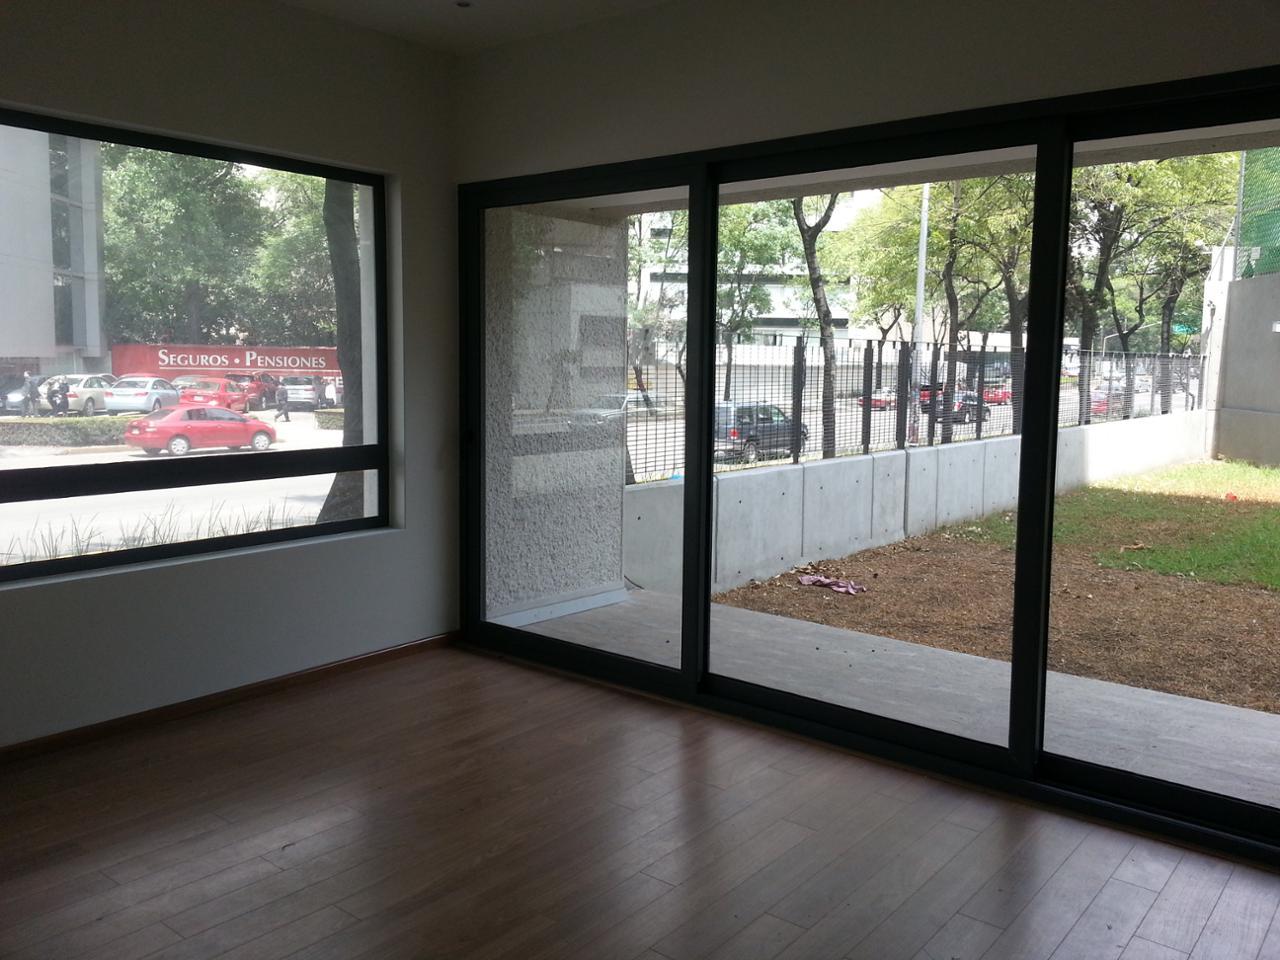 Departamento en Renta Mazatlán, Hipódromo Condesa, Cuauhtémoc, Distrito Federal (cdmx)